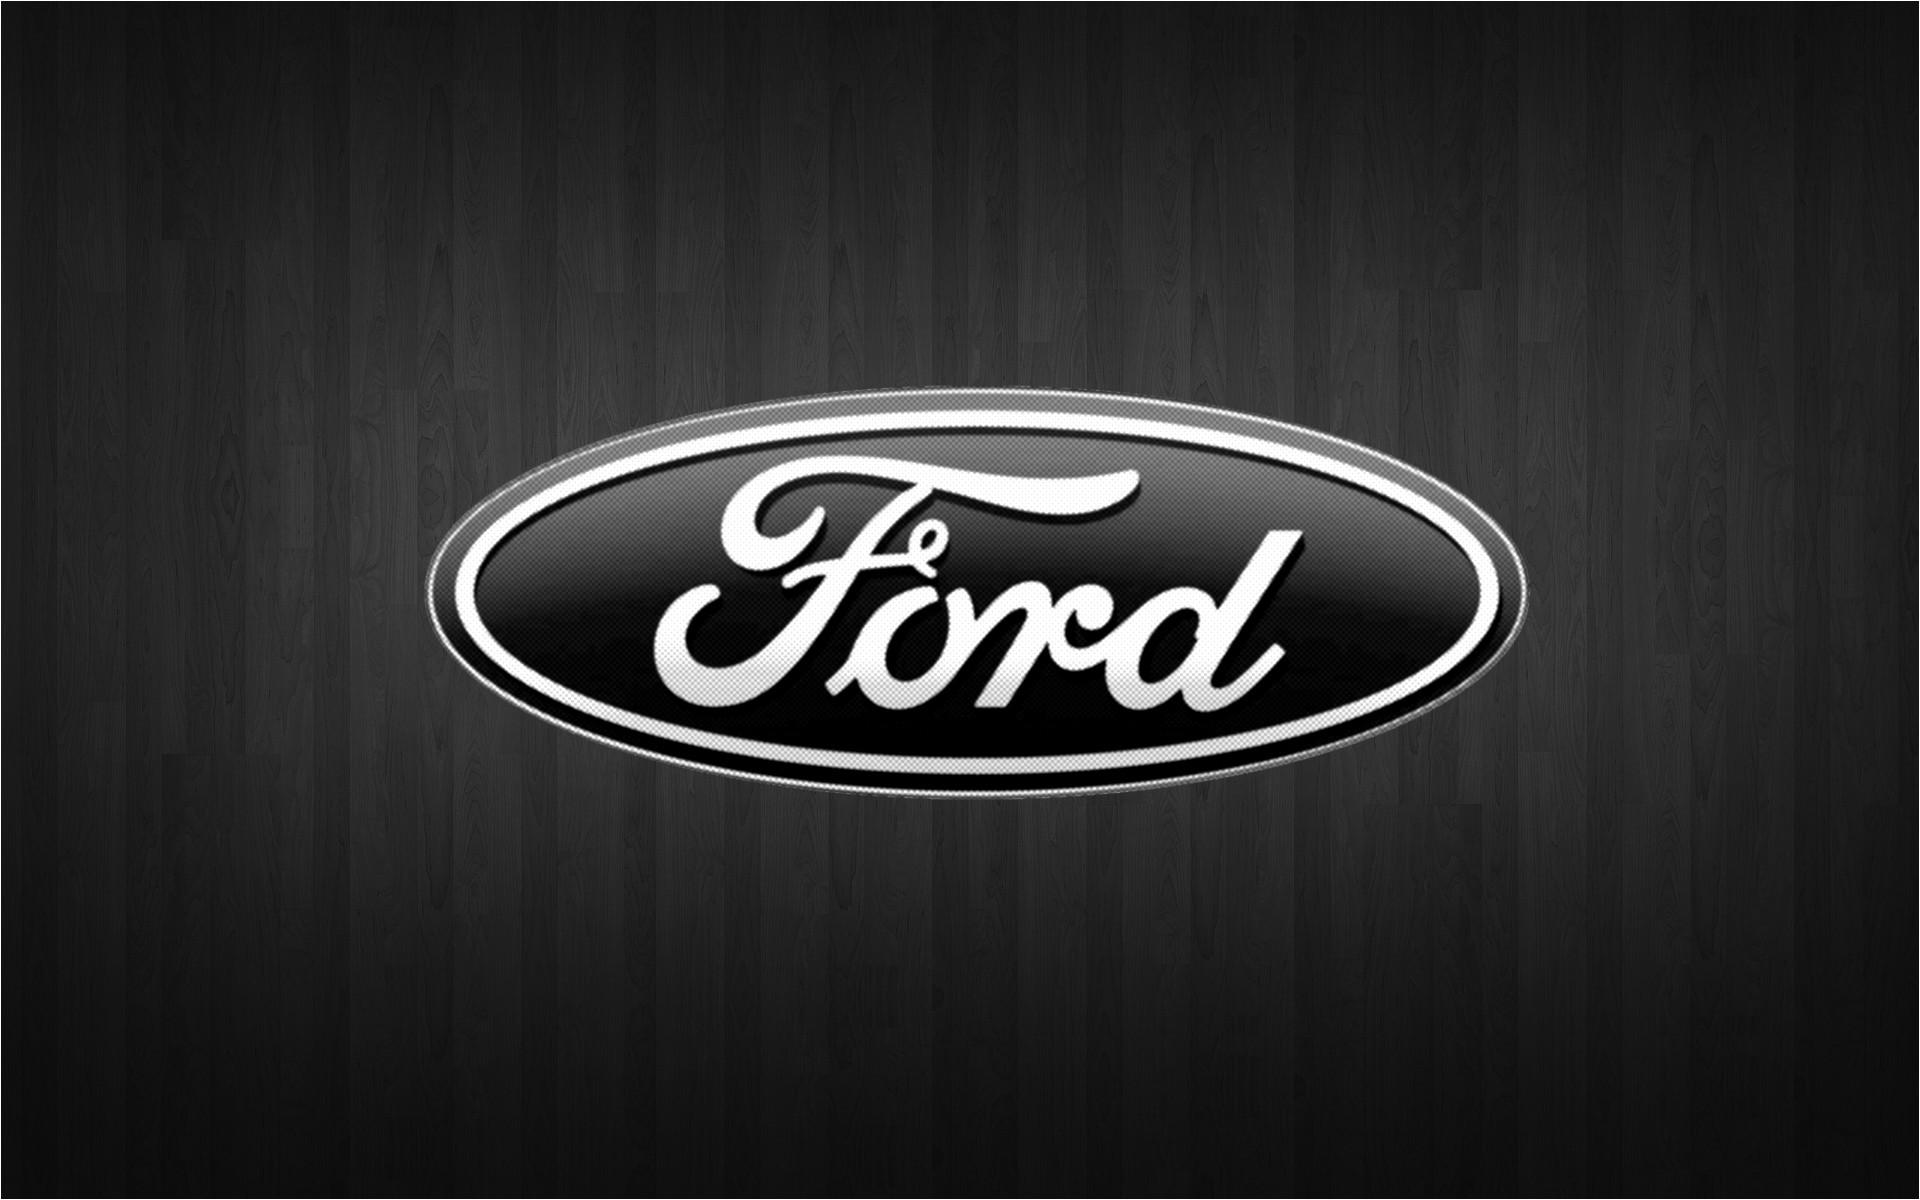 Ford Wallpaper #806306 Ford Wallpaper #806326 Ford Wallpaper #806294 .